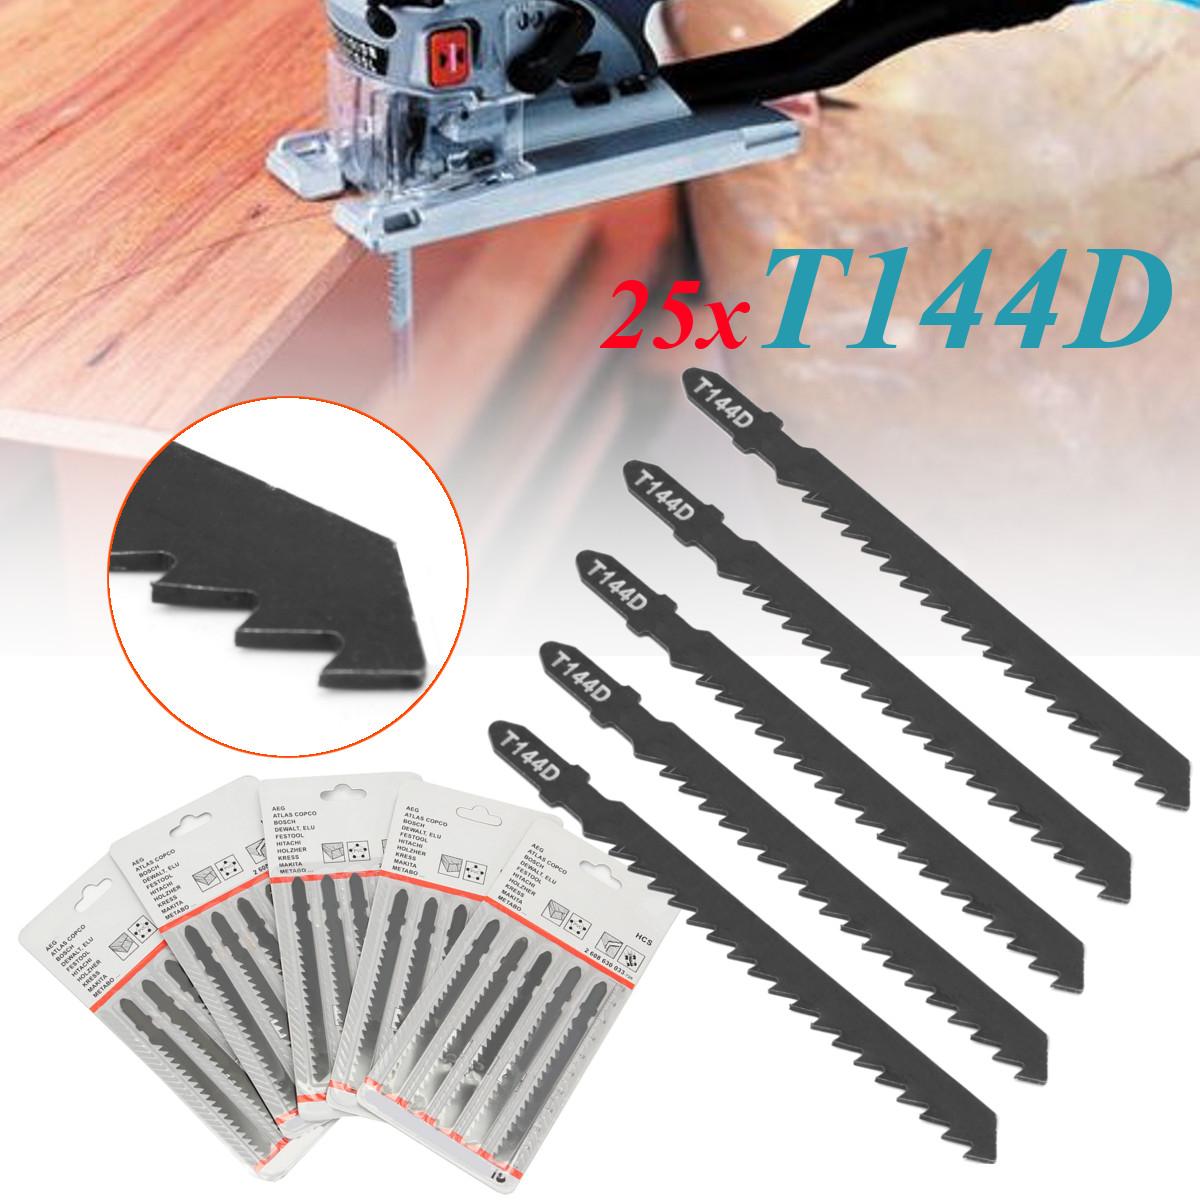 25Pcs T144D Hard Wood Curve Cut Jigsaw Sabre Saw Blade Serrate Stainless Black